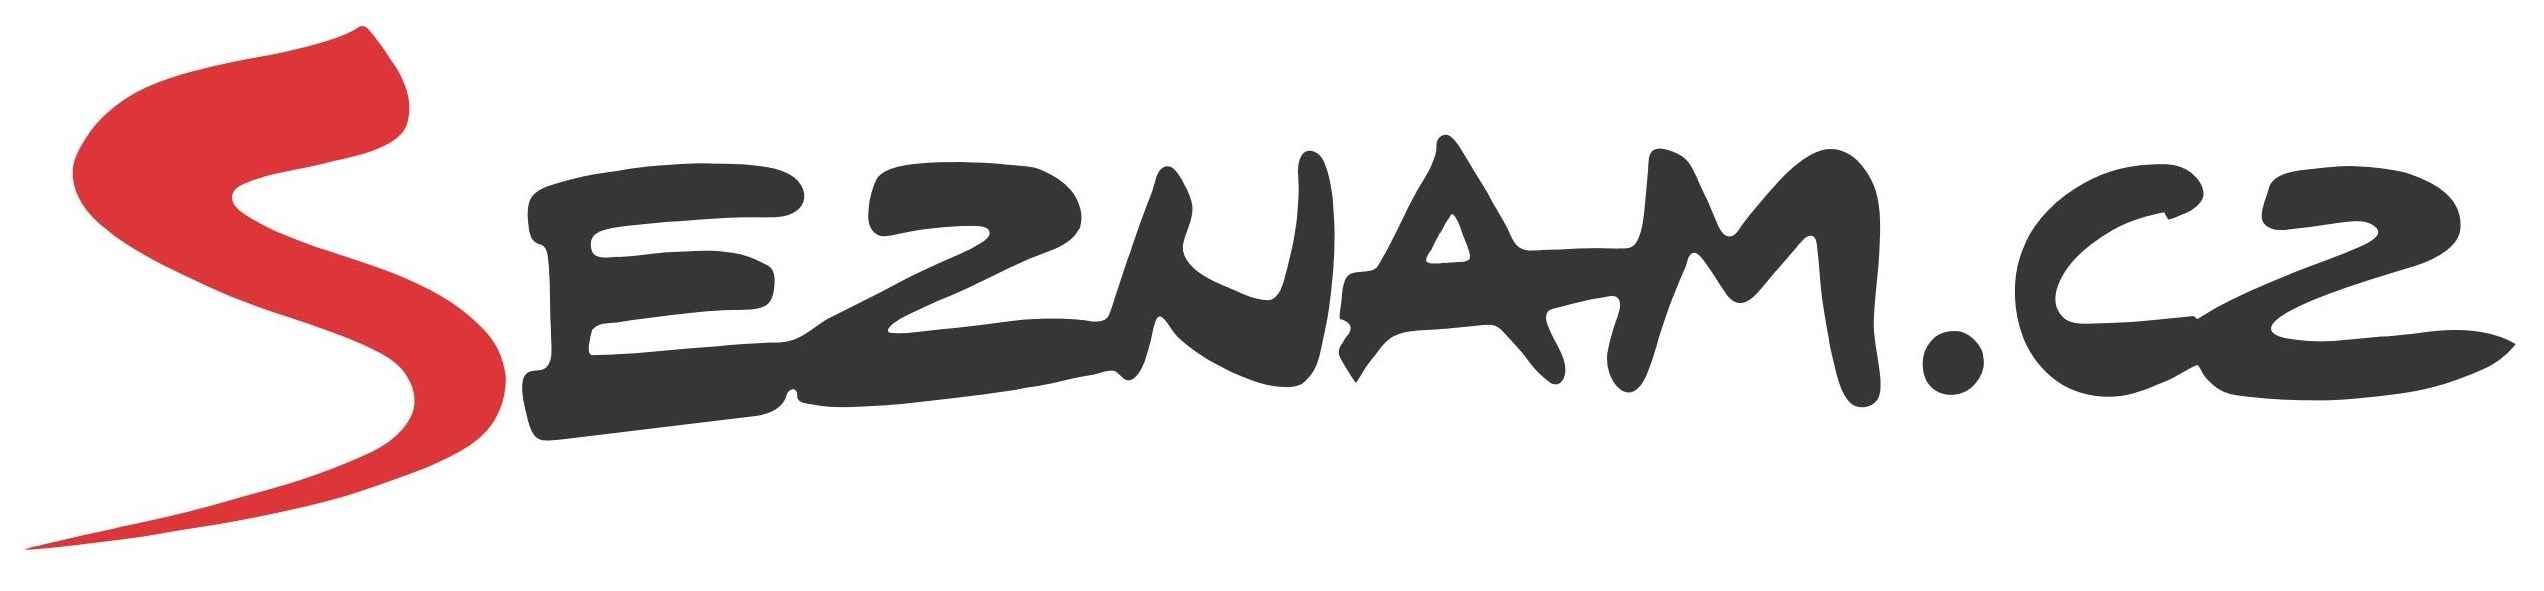 Seznam.cz Logo [EPS File] png